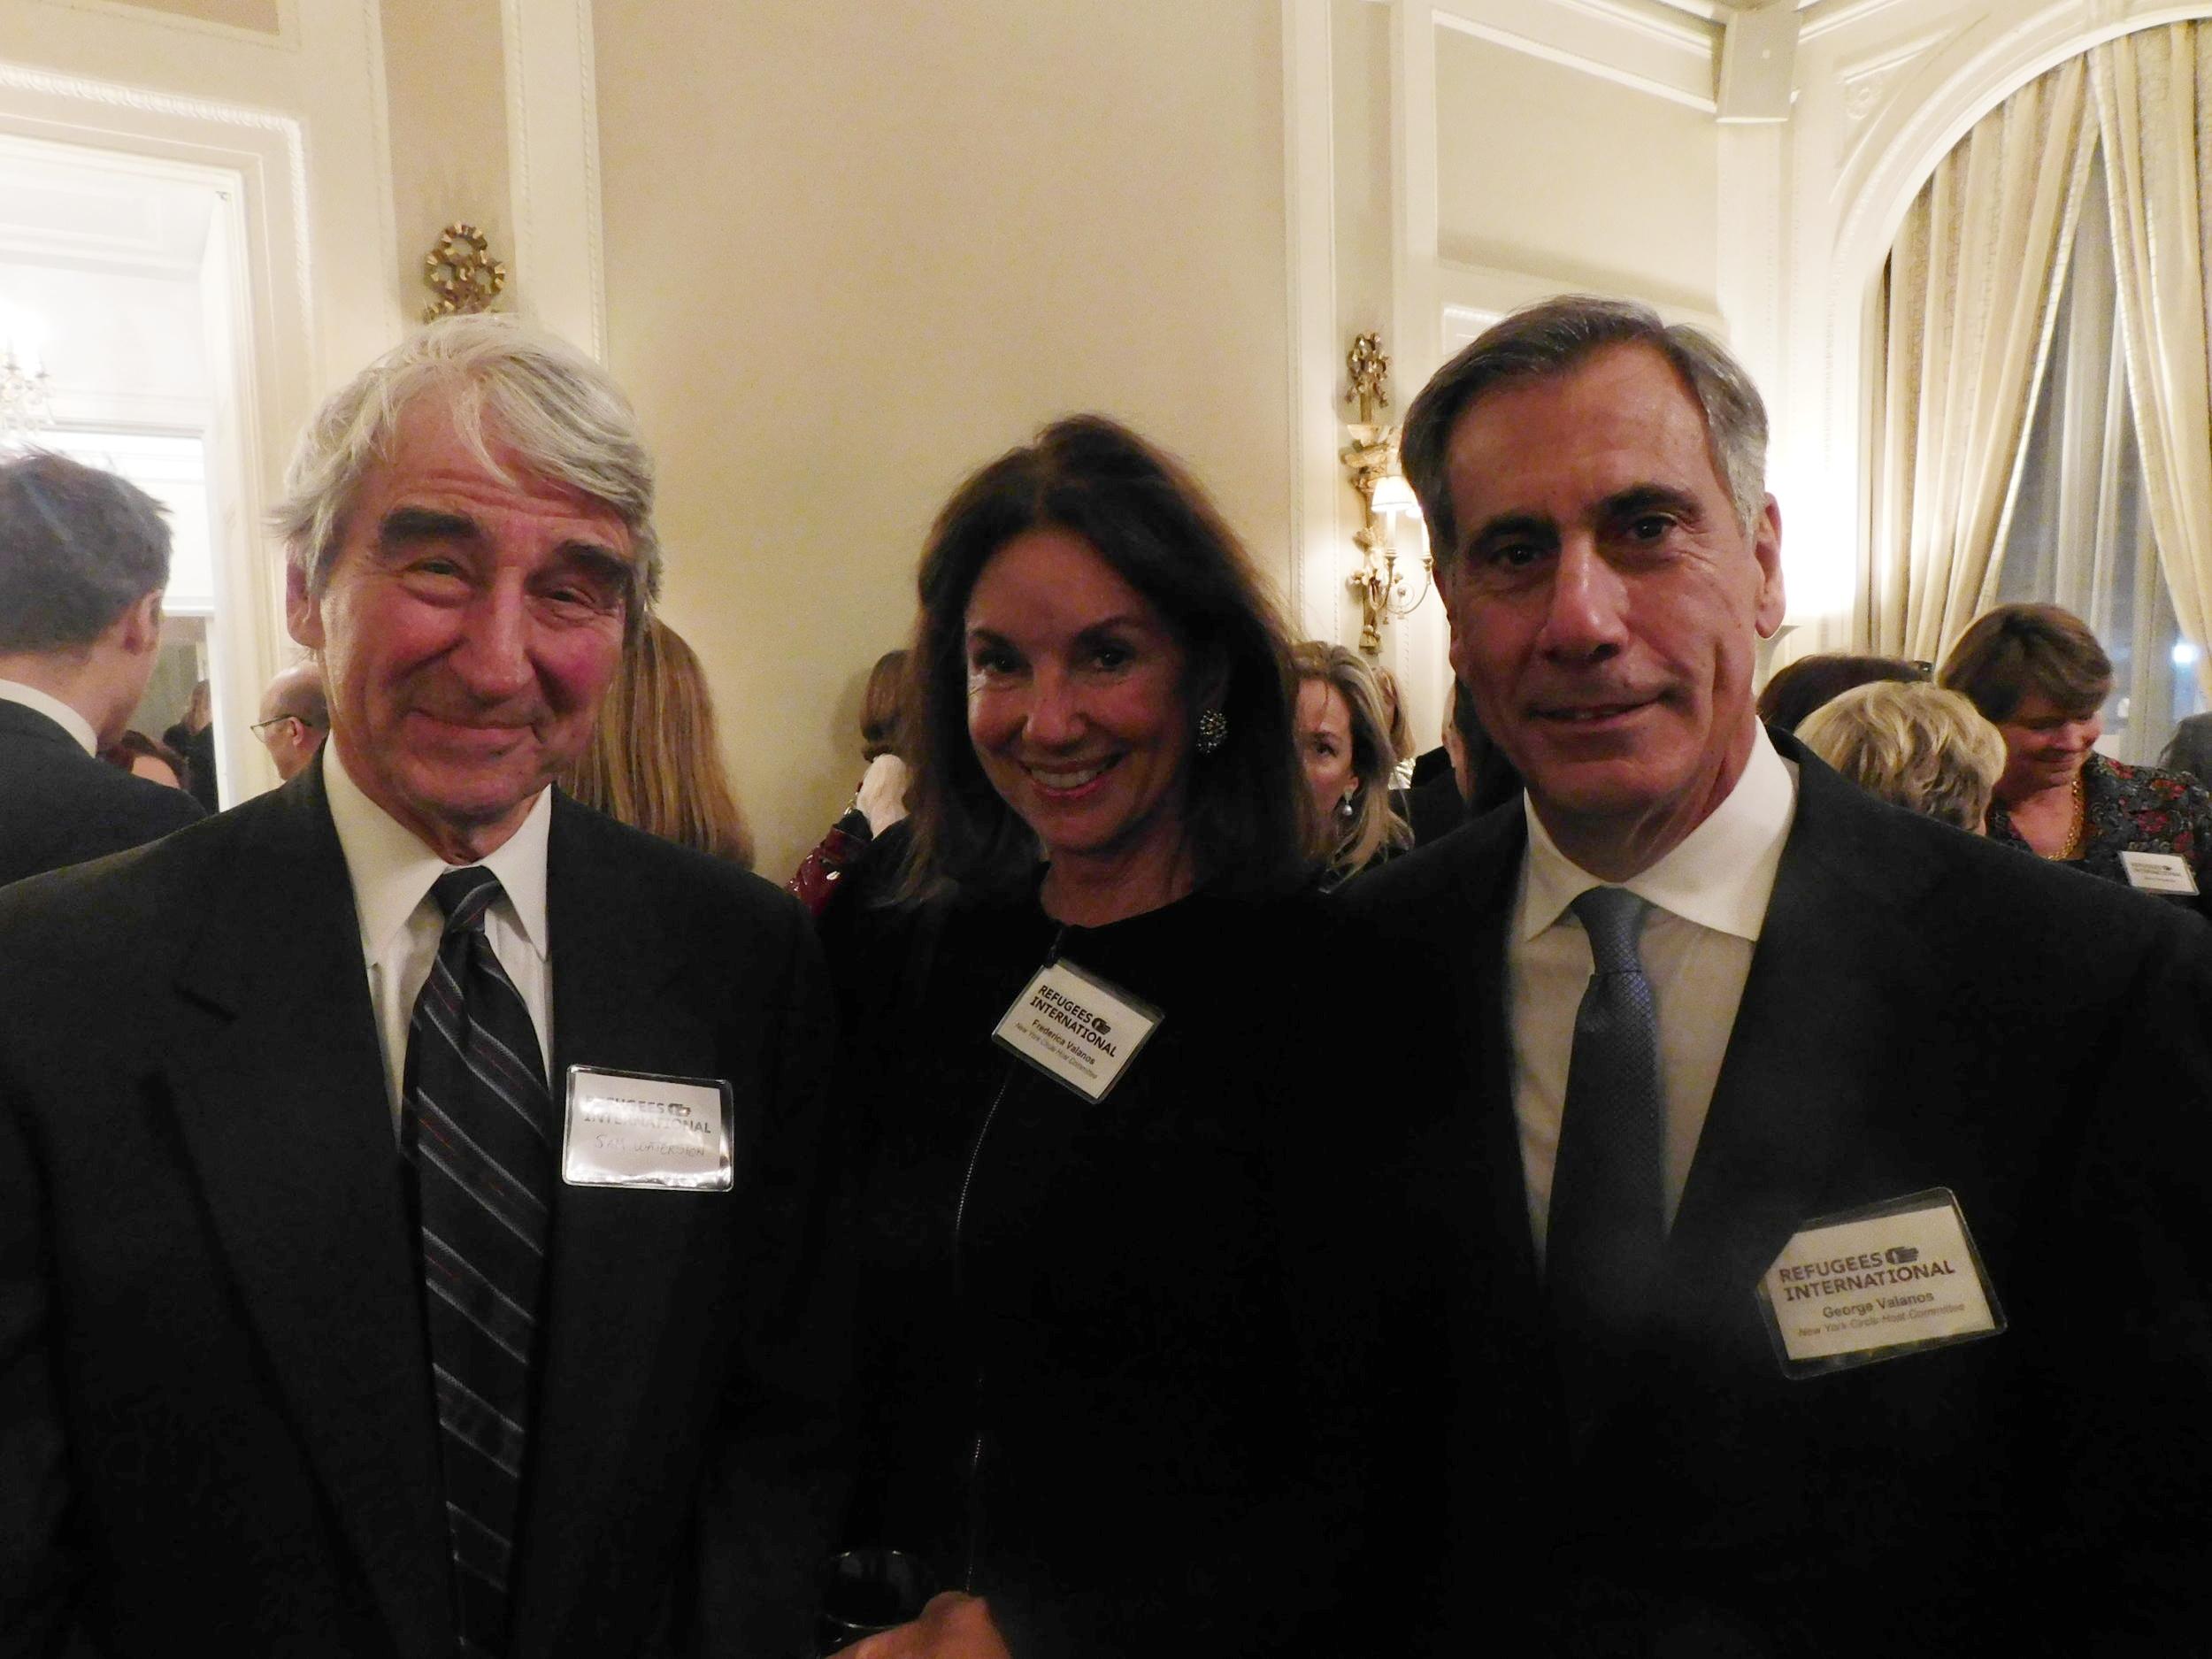 RI Director Emeritus Sam Waterston, Frederica Valanos, and George Valanos